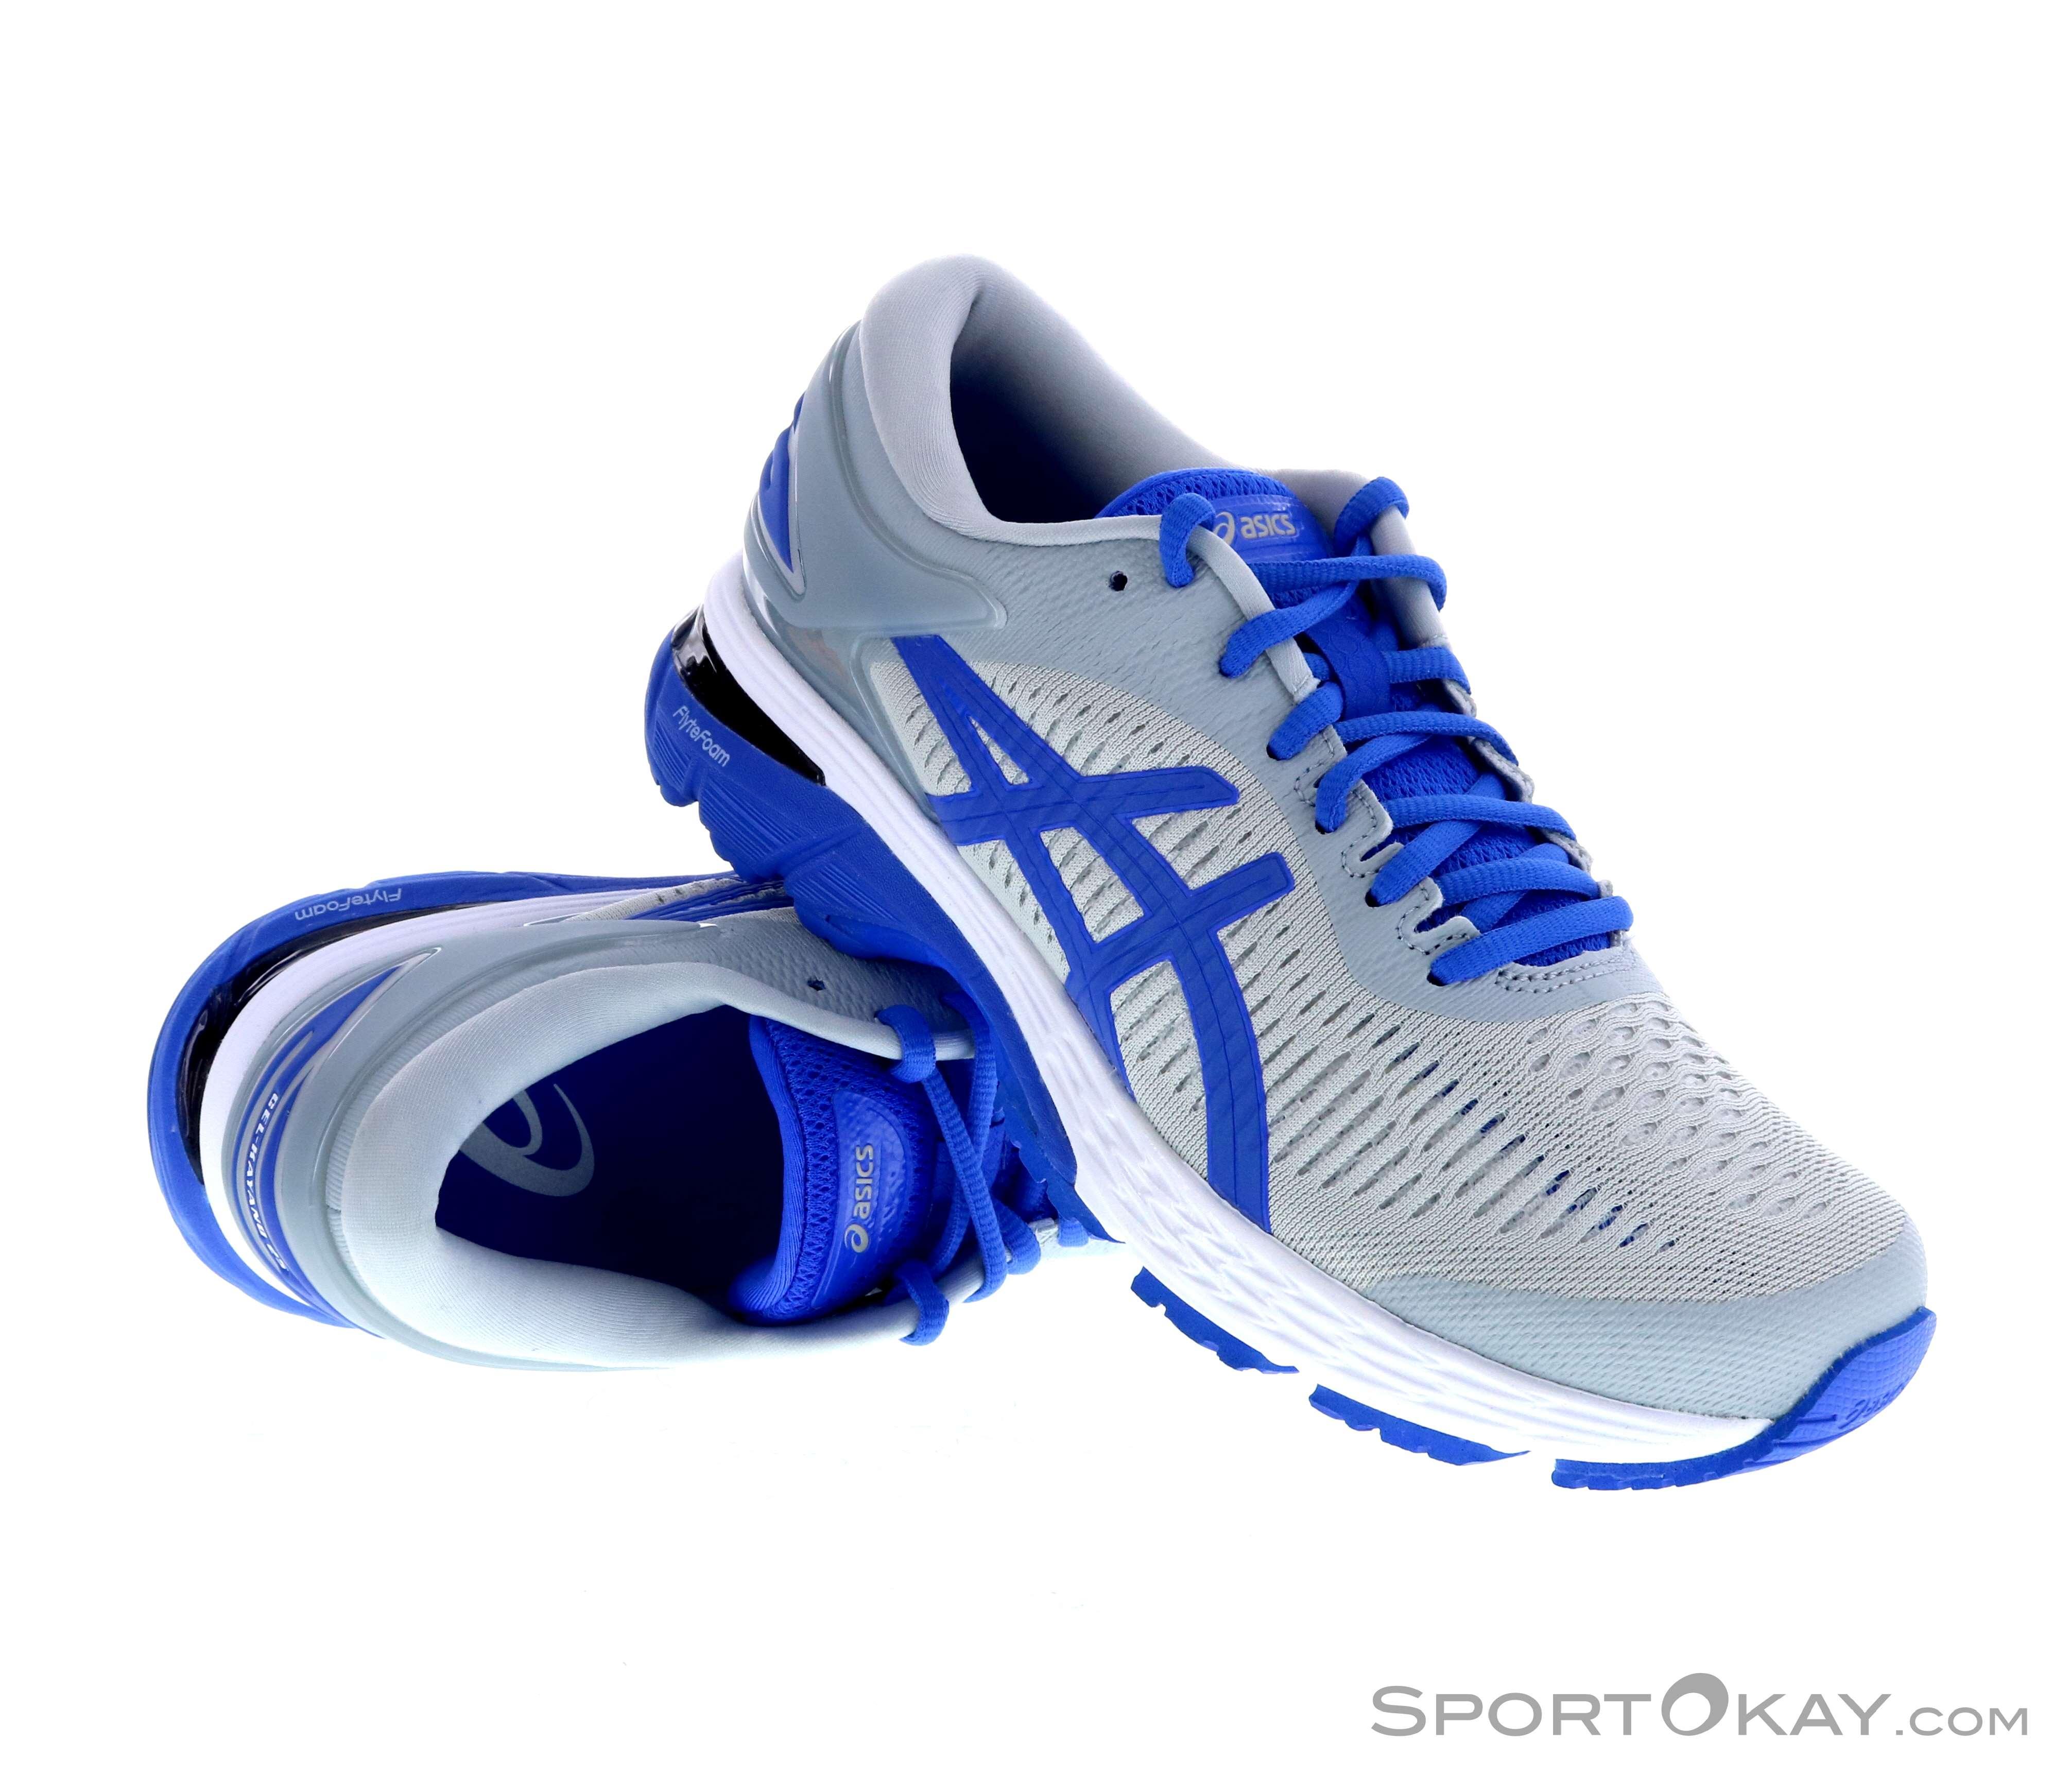 Asics Asics Gel-Kayano 25 Lite Womens Running Shoes